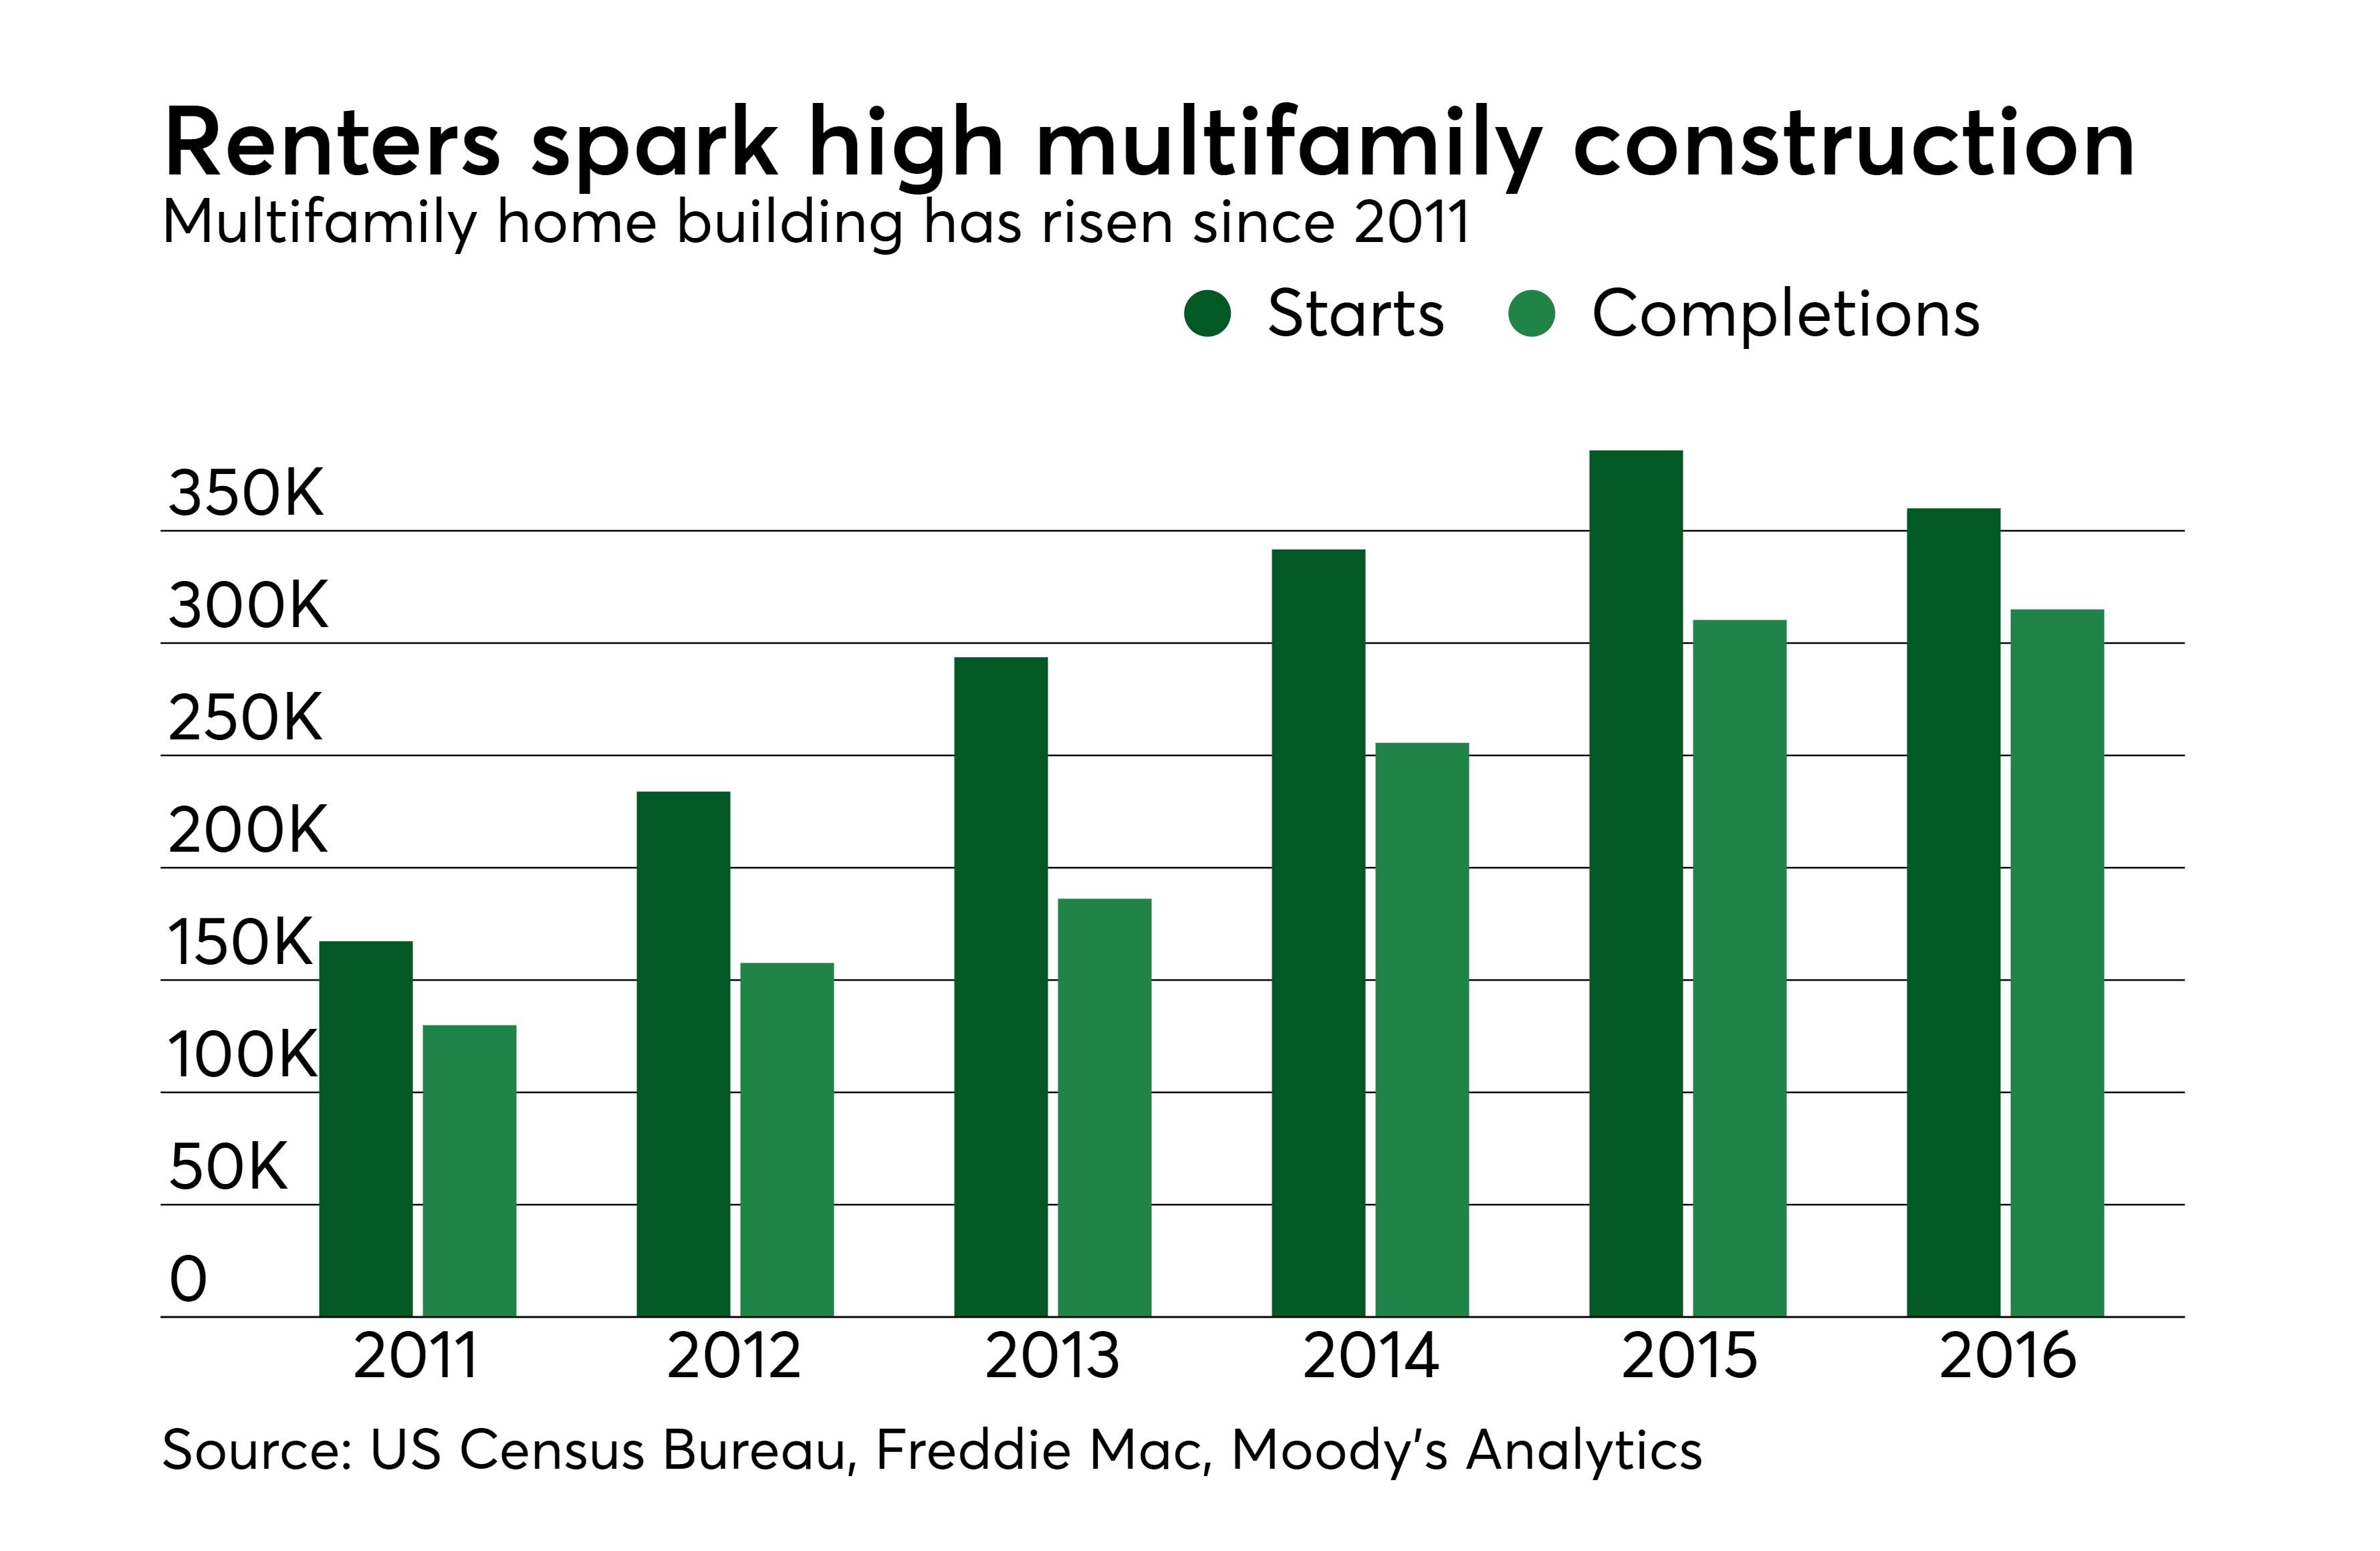 https://assets.sourcemedia.com/54/35/f5c35ba546fa9e088210b49097b9/maj-05182016-multifamily-construction-starts-completions-4.jpeg